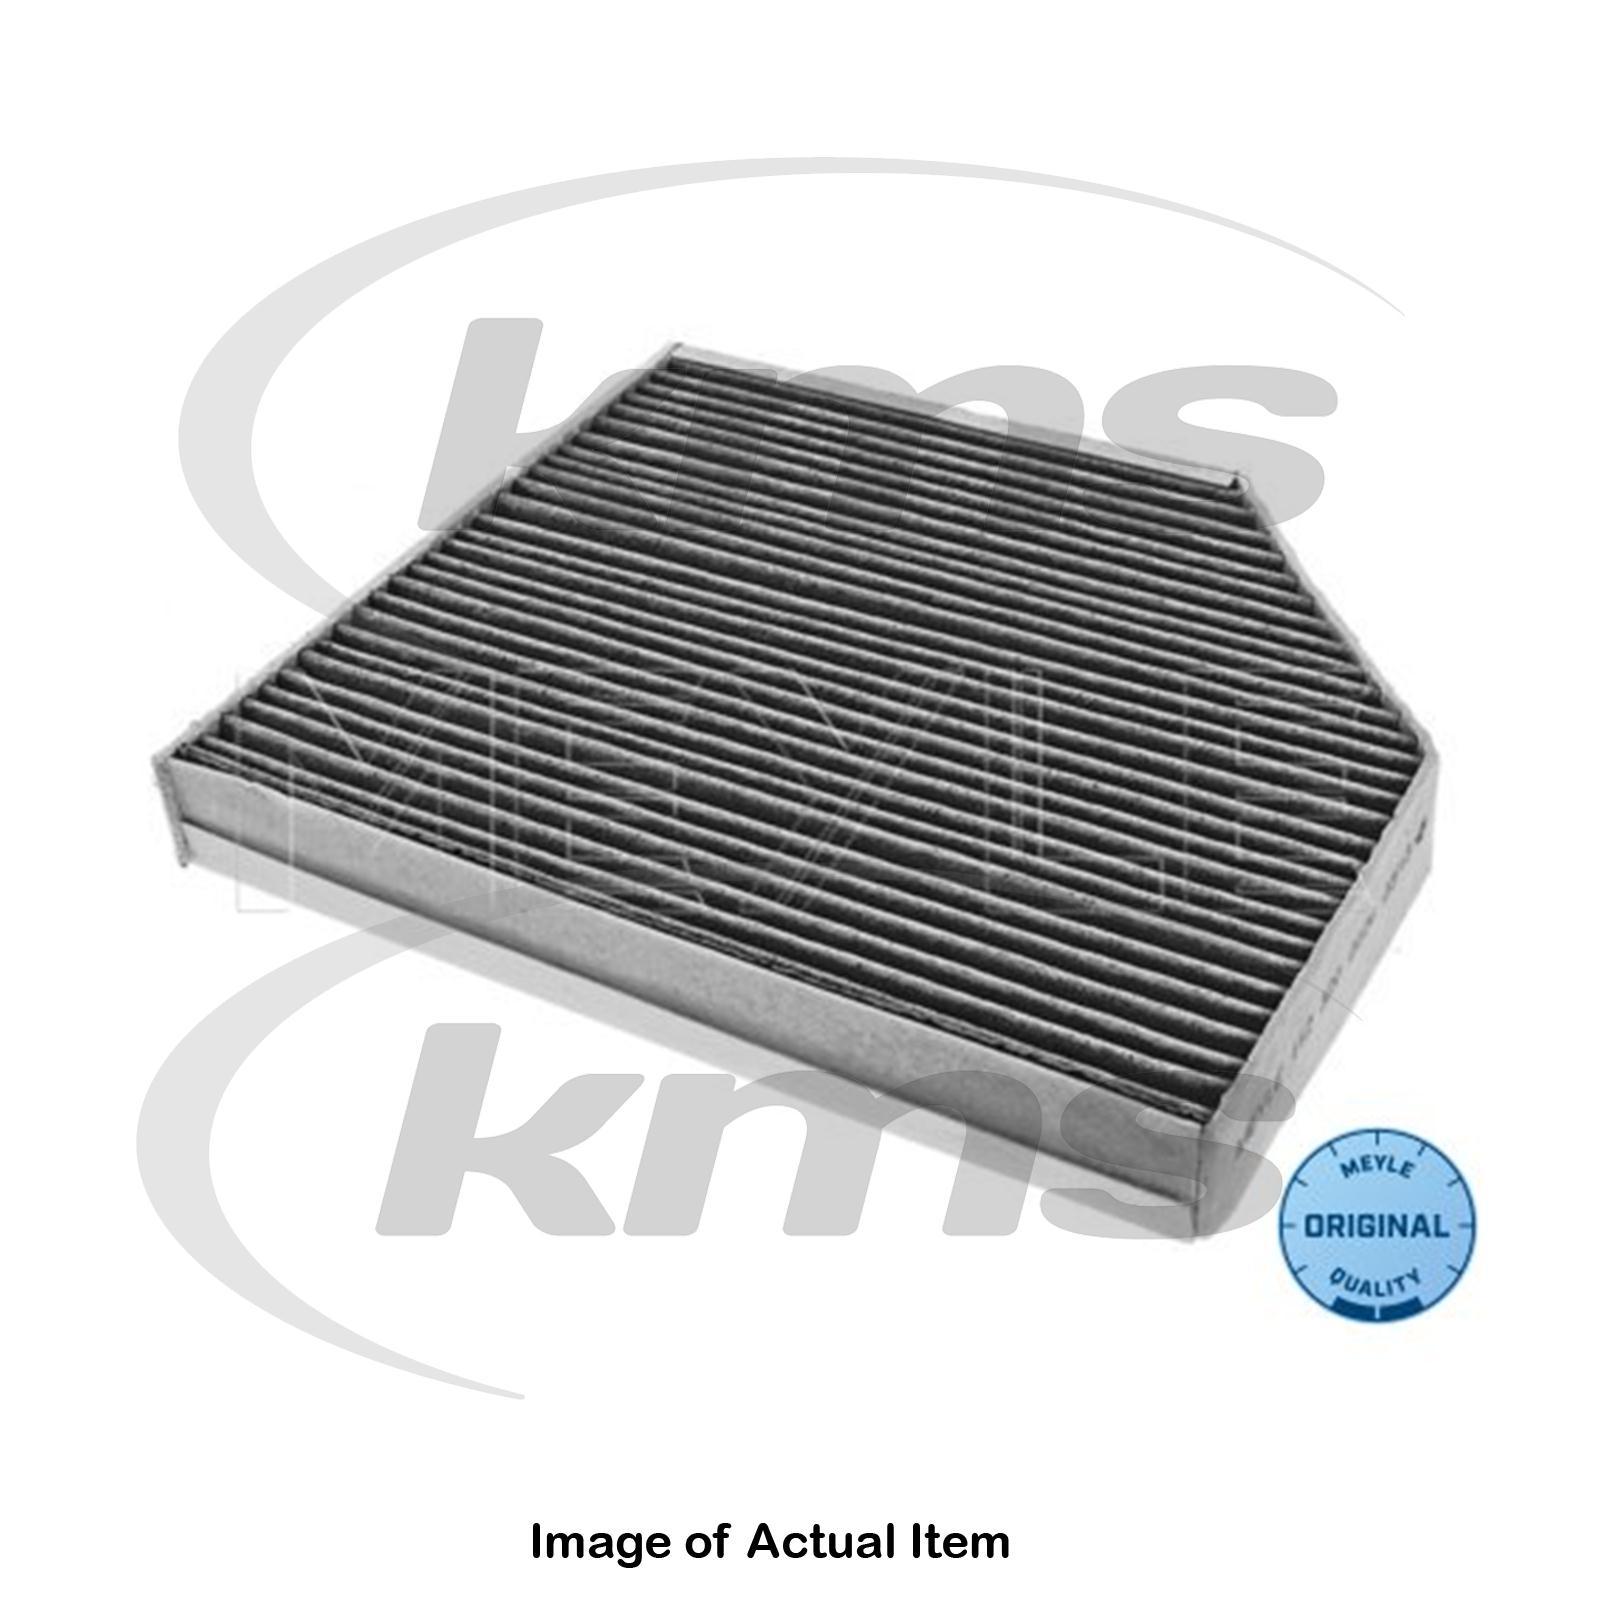 Maxgear interior filtro Filtro Filtro de polen audi Porsche 26-0633